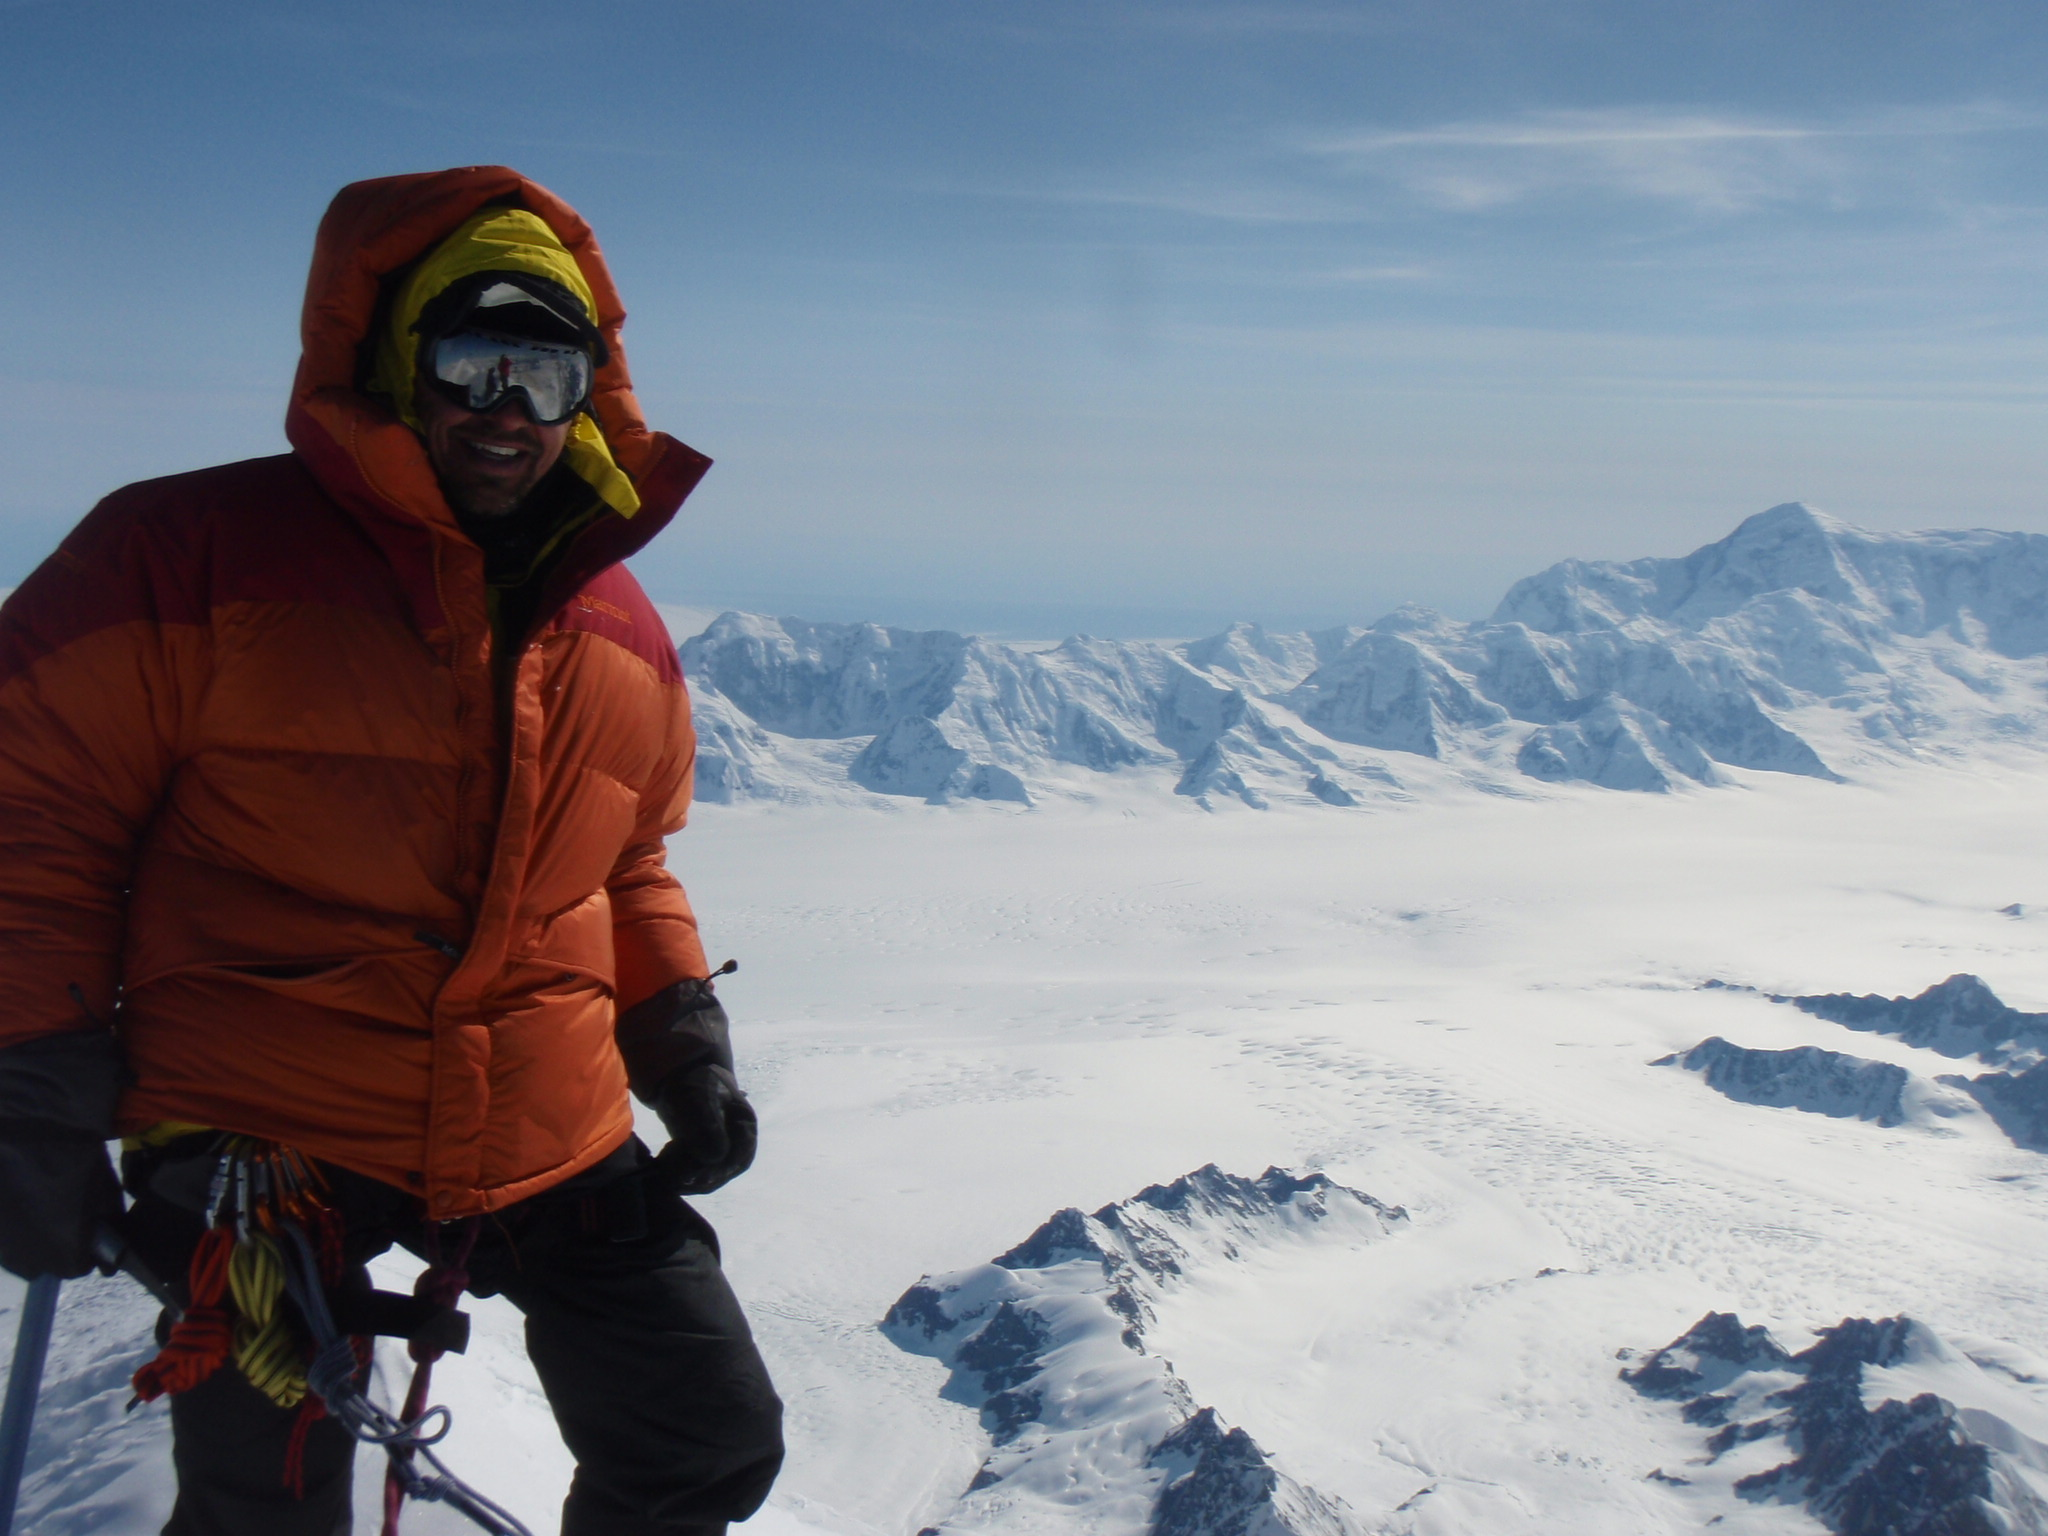 On Summit of Mount Logan at 5959m